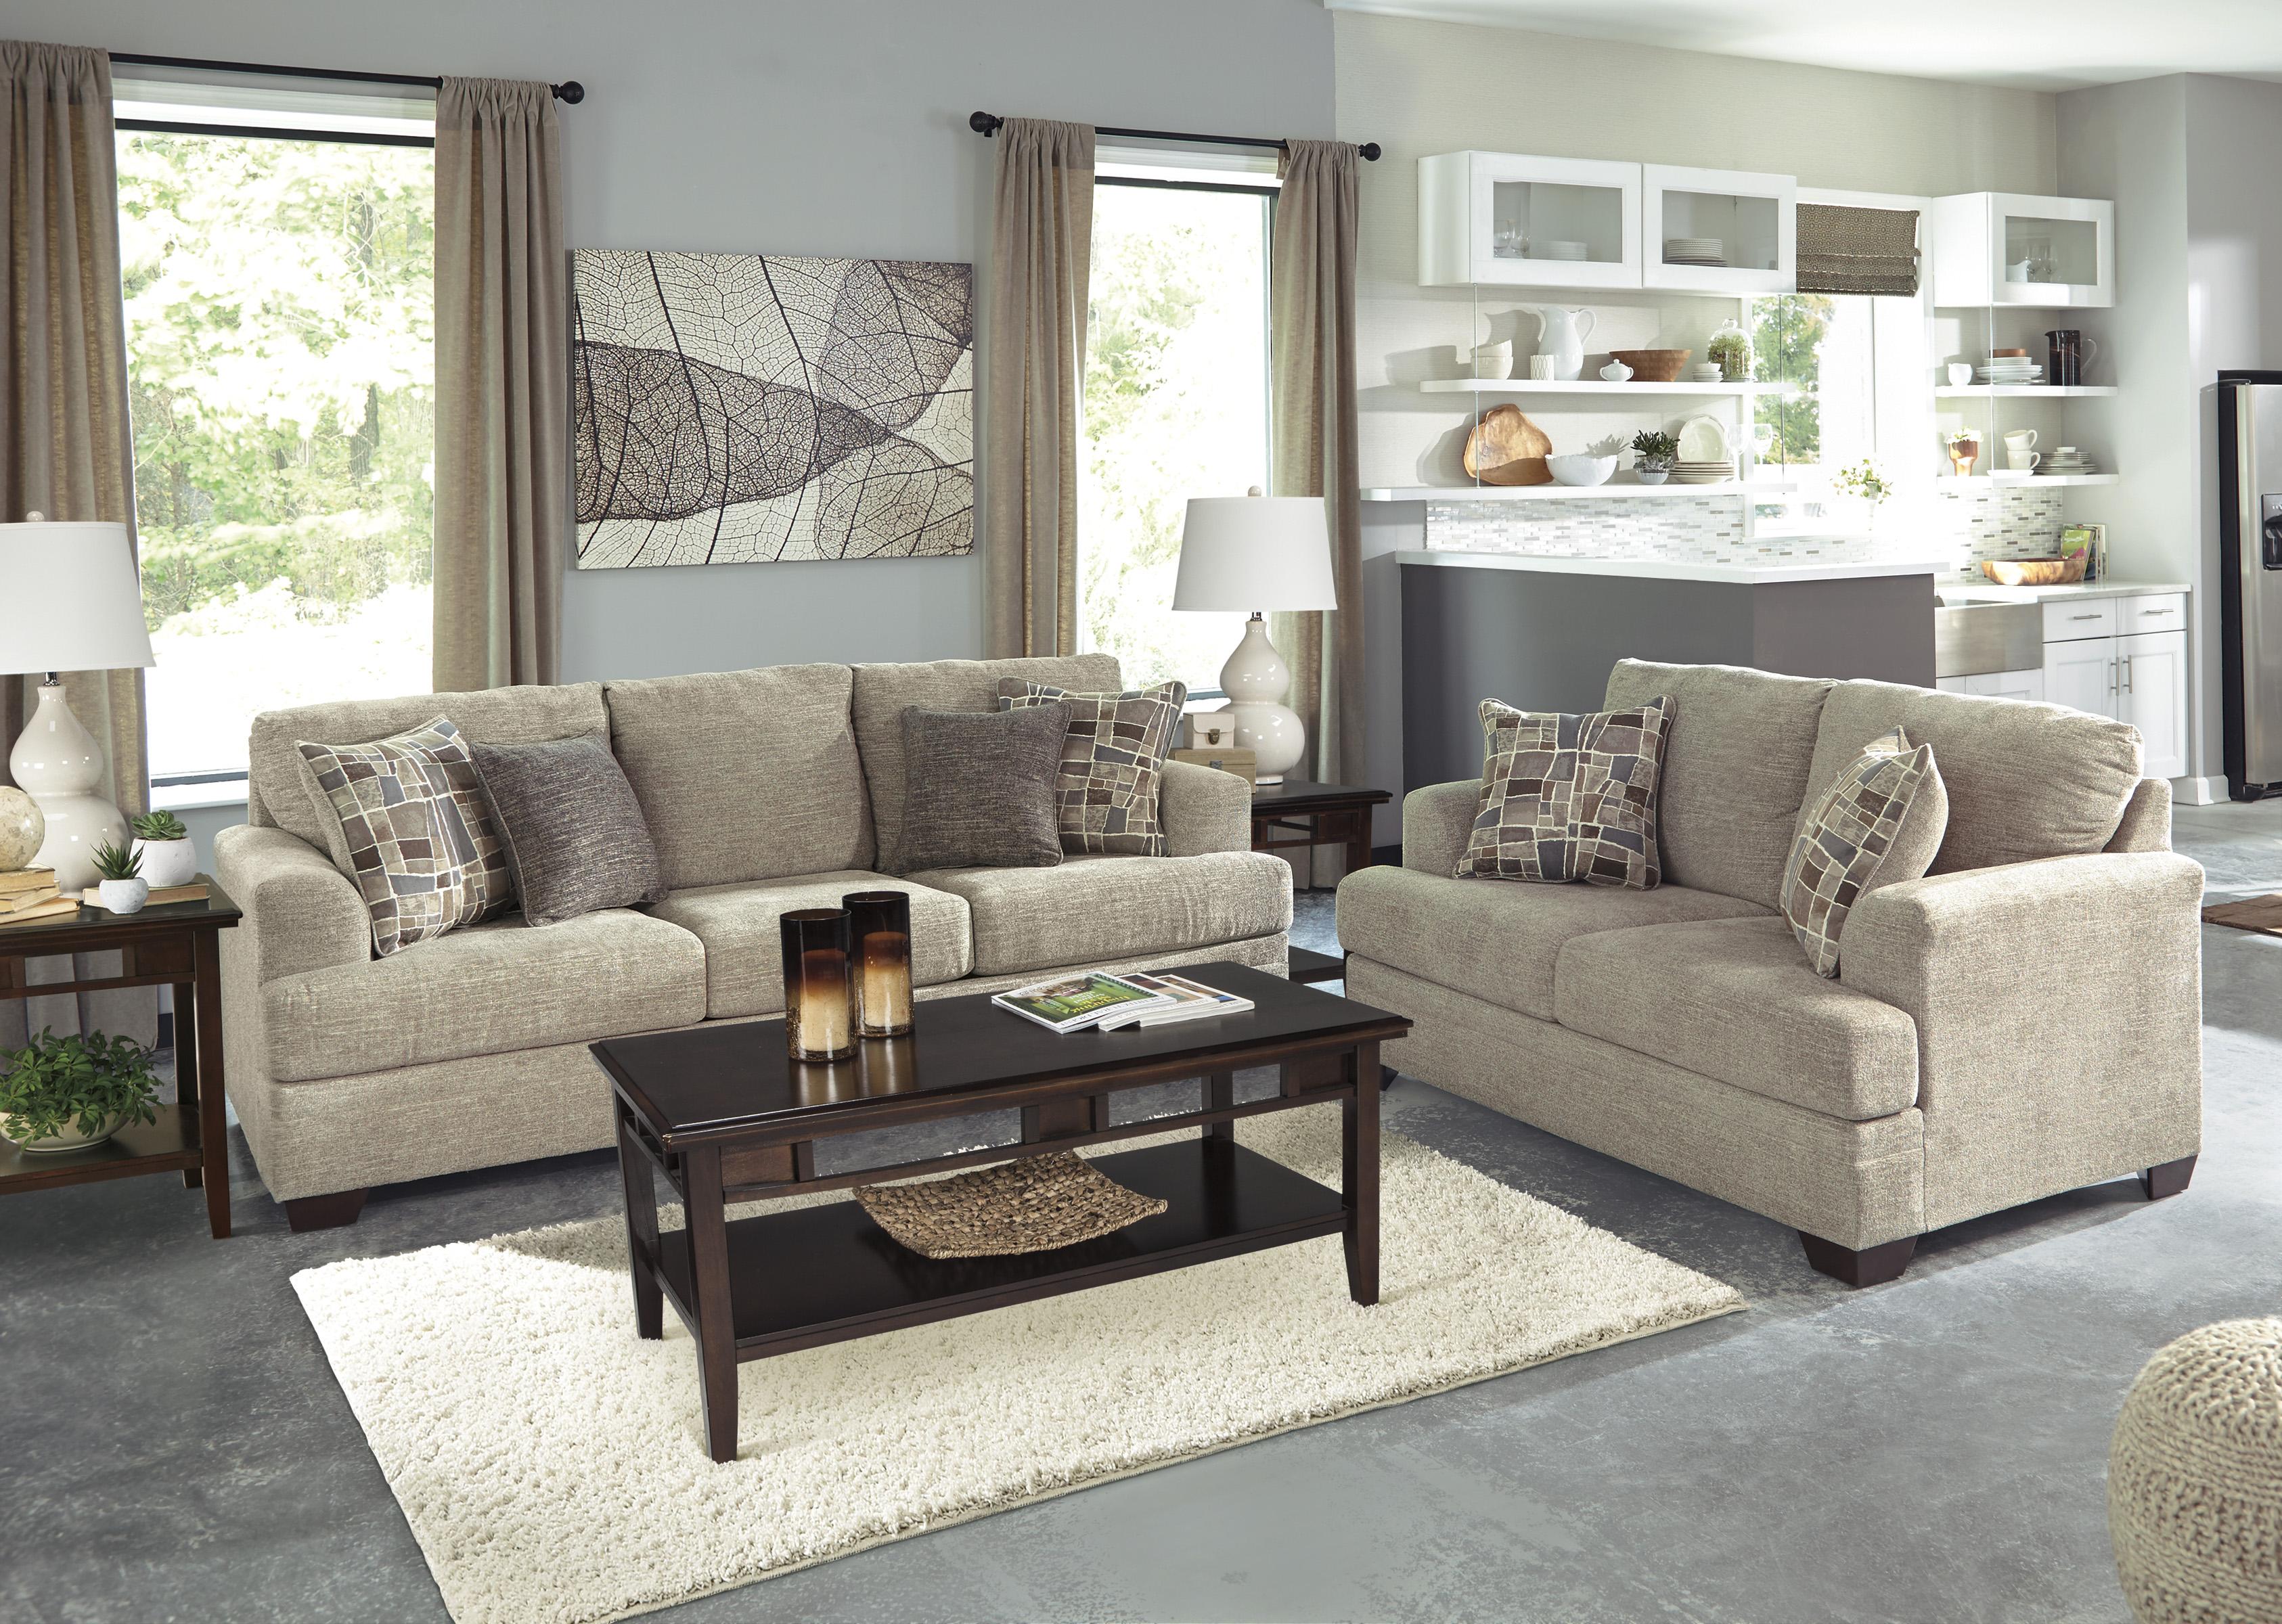 Barrish Sisal Sofa Marjen Of Chicago Chicago Discount